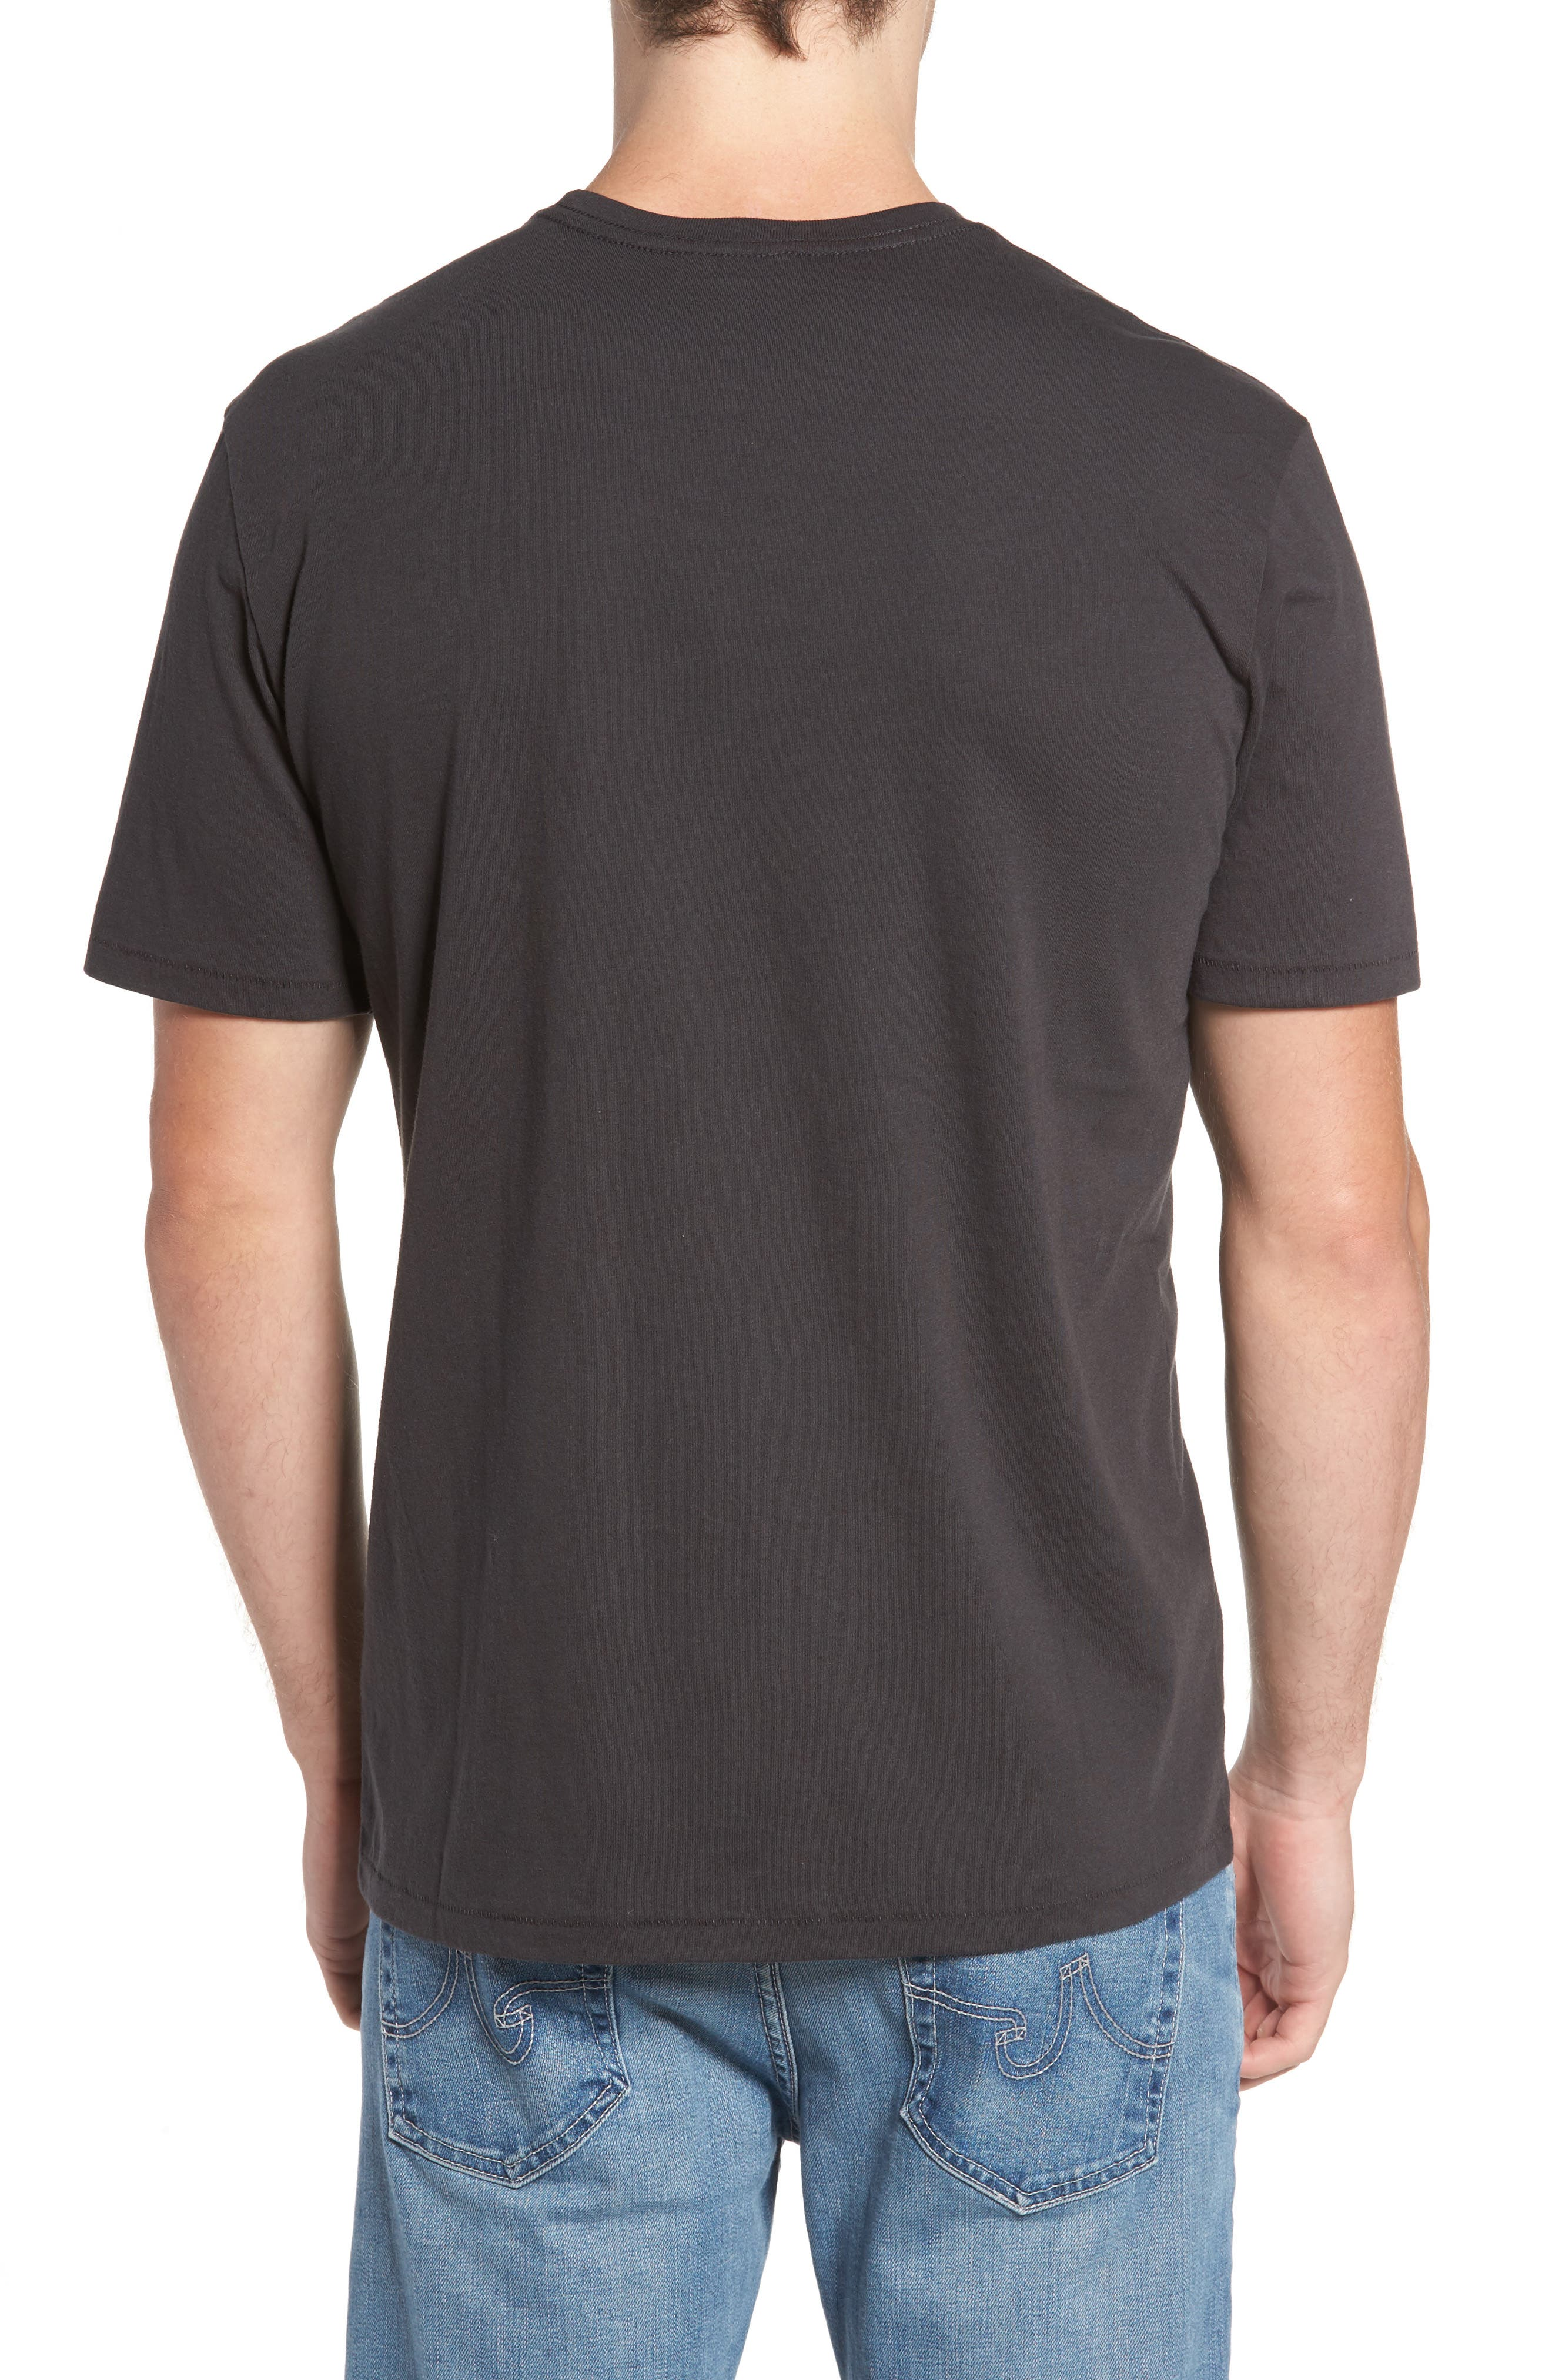 Broadcast T-Shirt,                             Alternate thumbnail 2, color,                             005